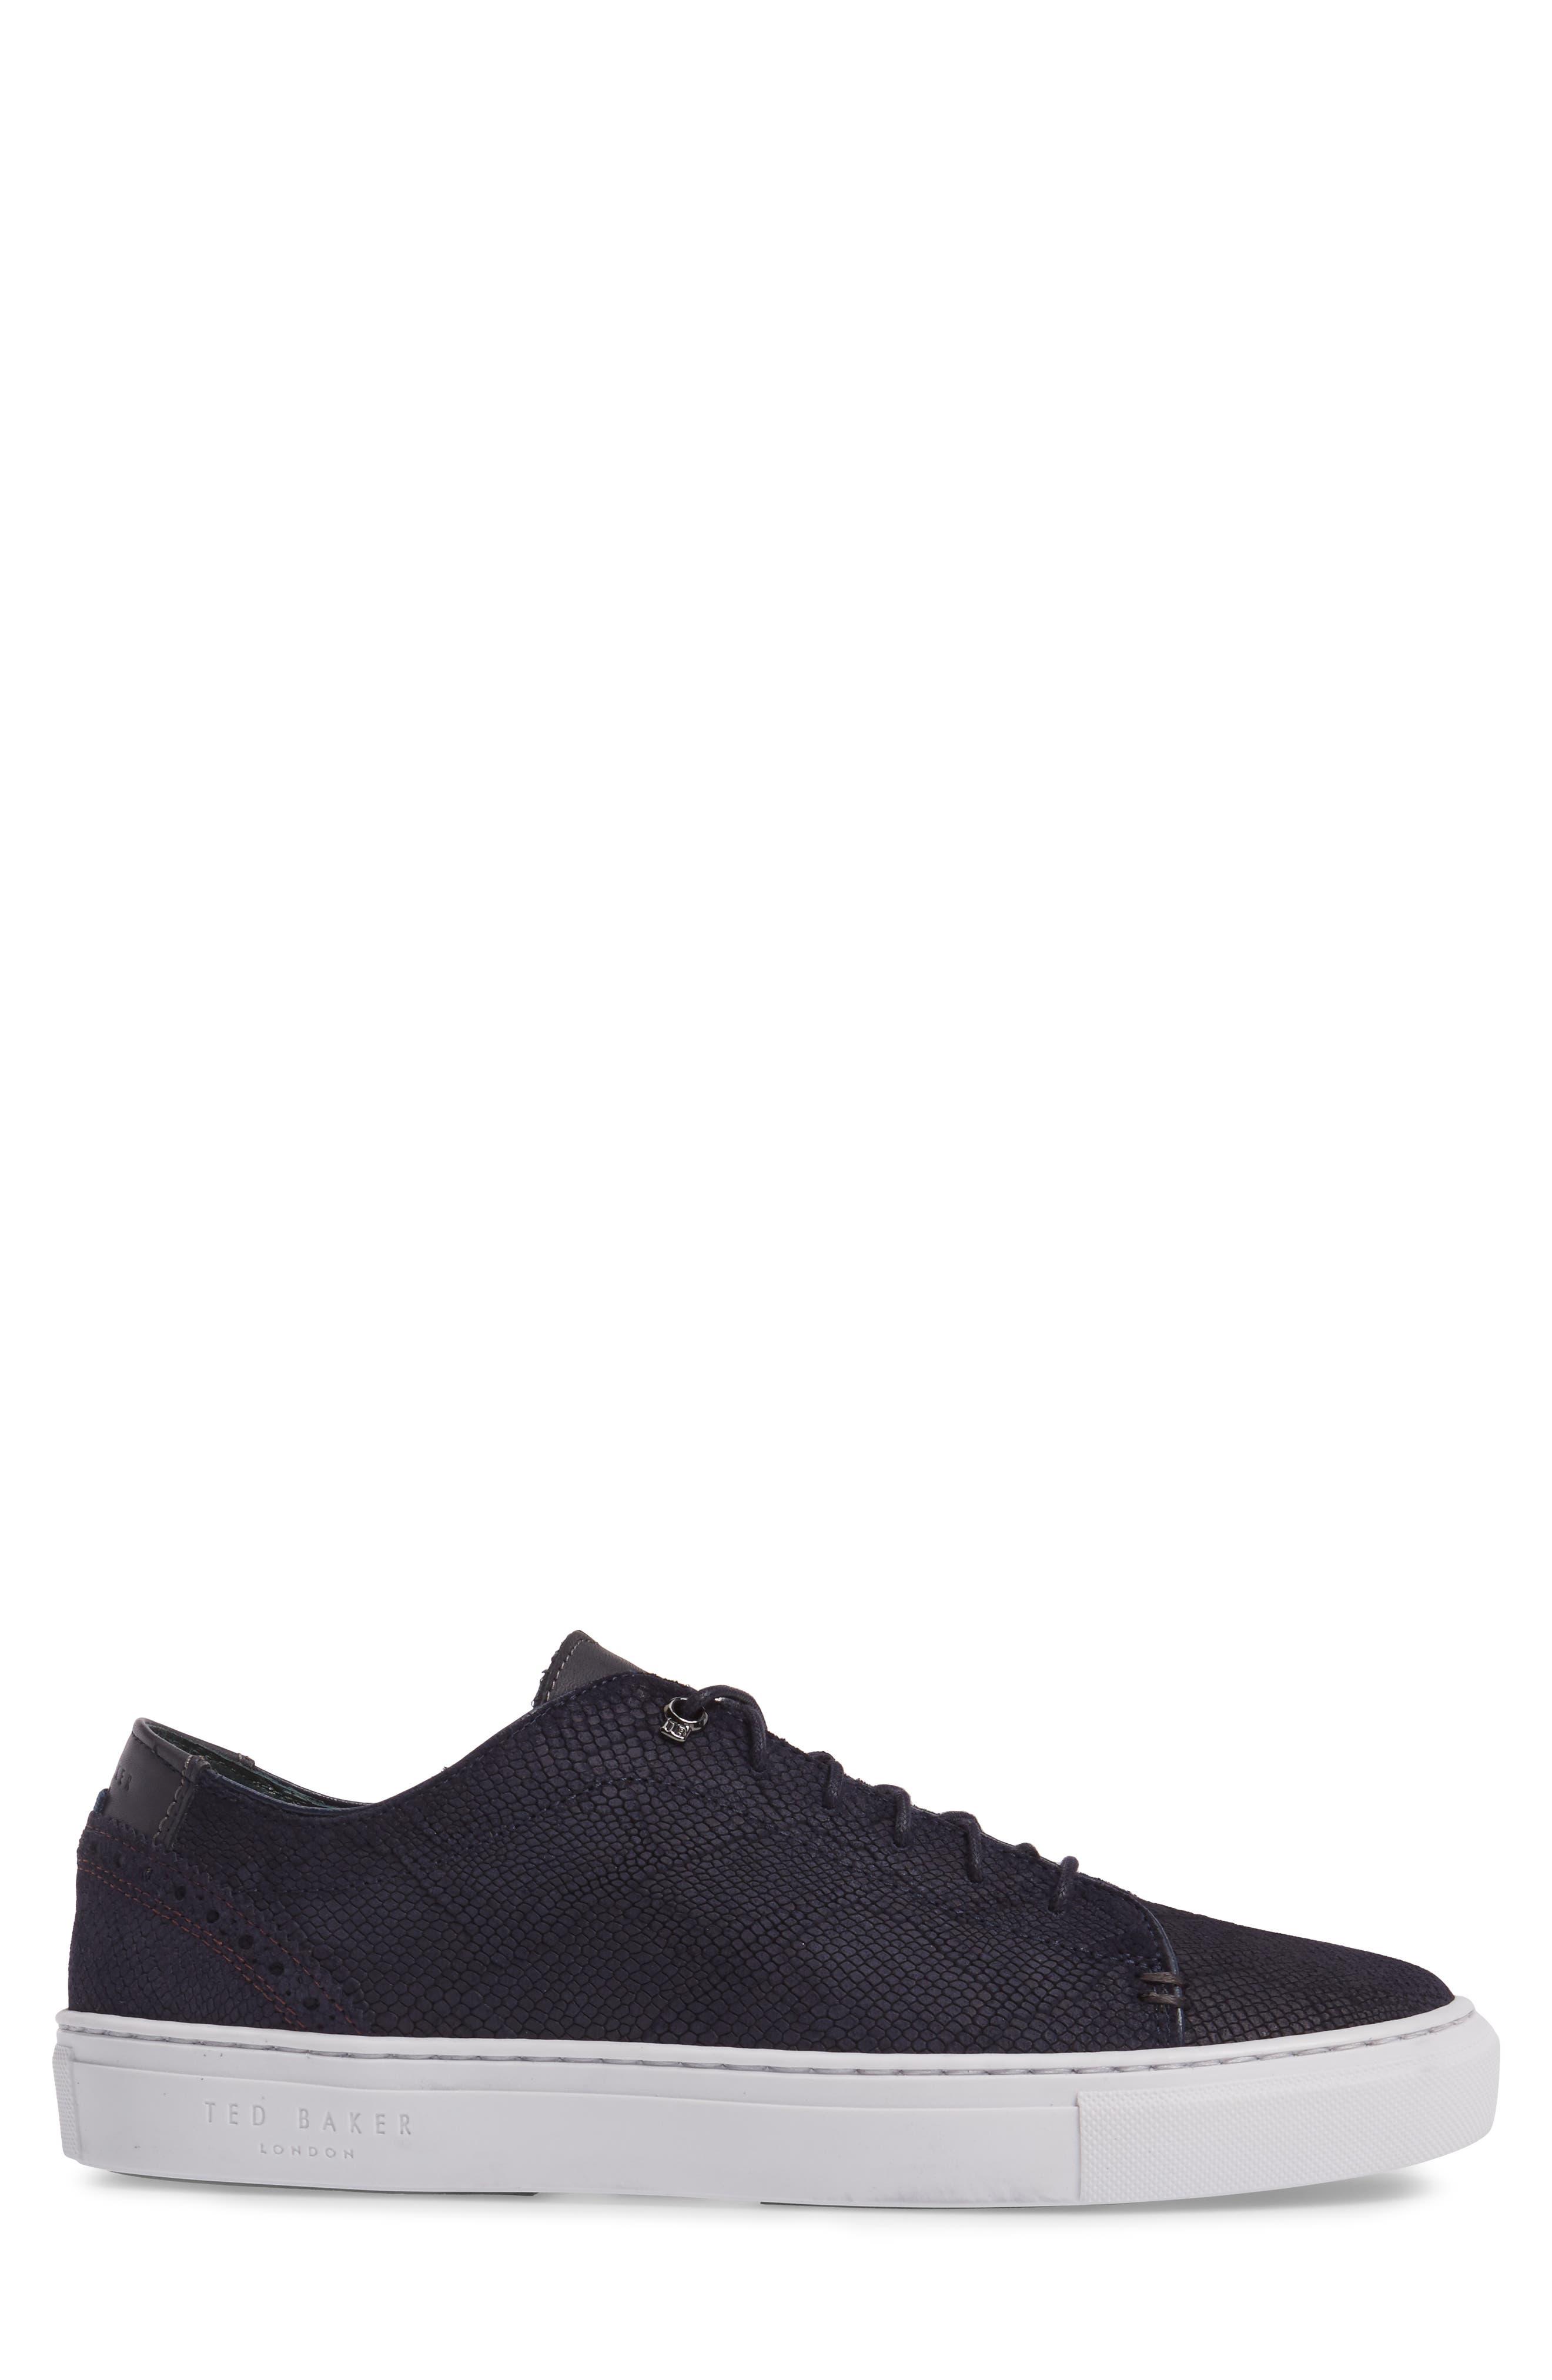 Duuke Sneaker,                             Alternate thumbnail 3, color,                             Dark Blue Suede